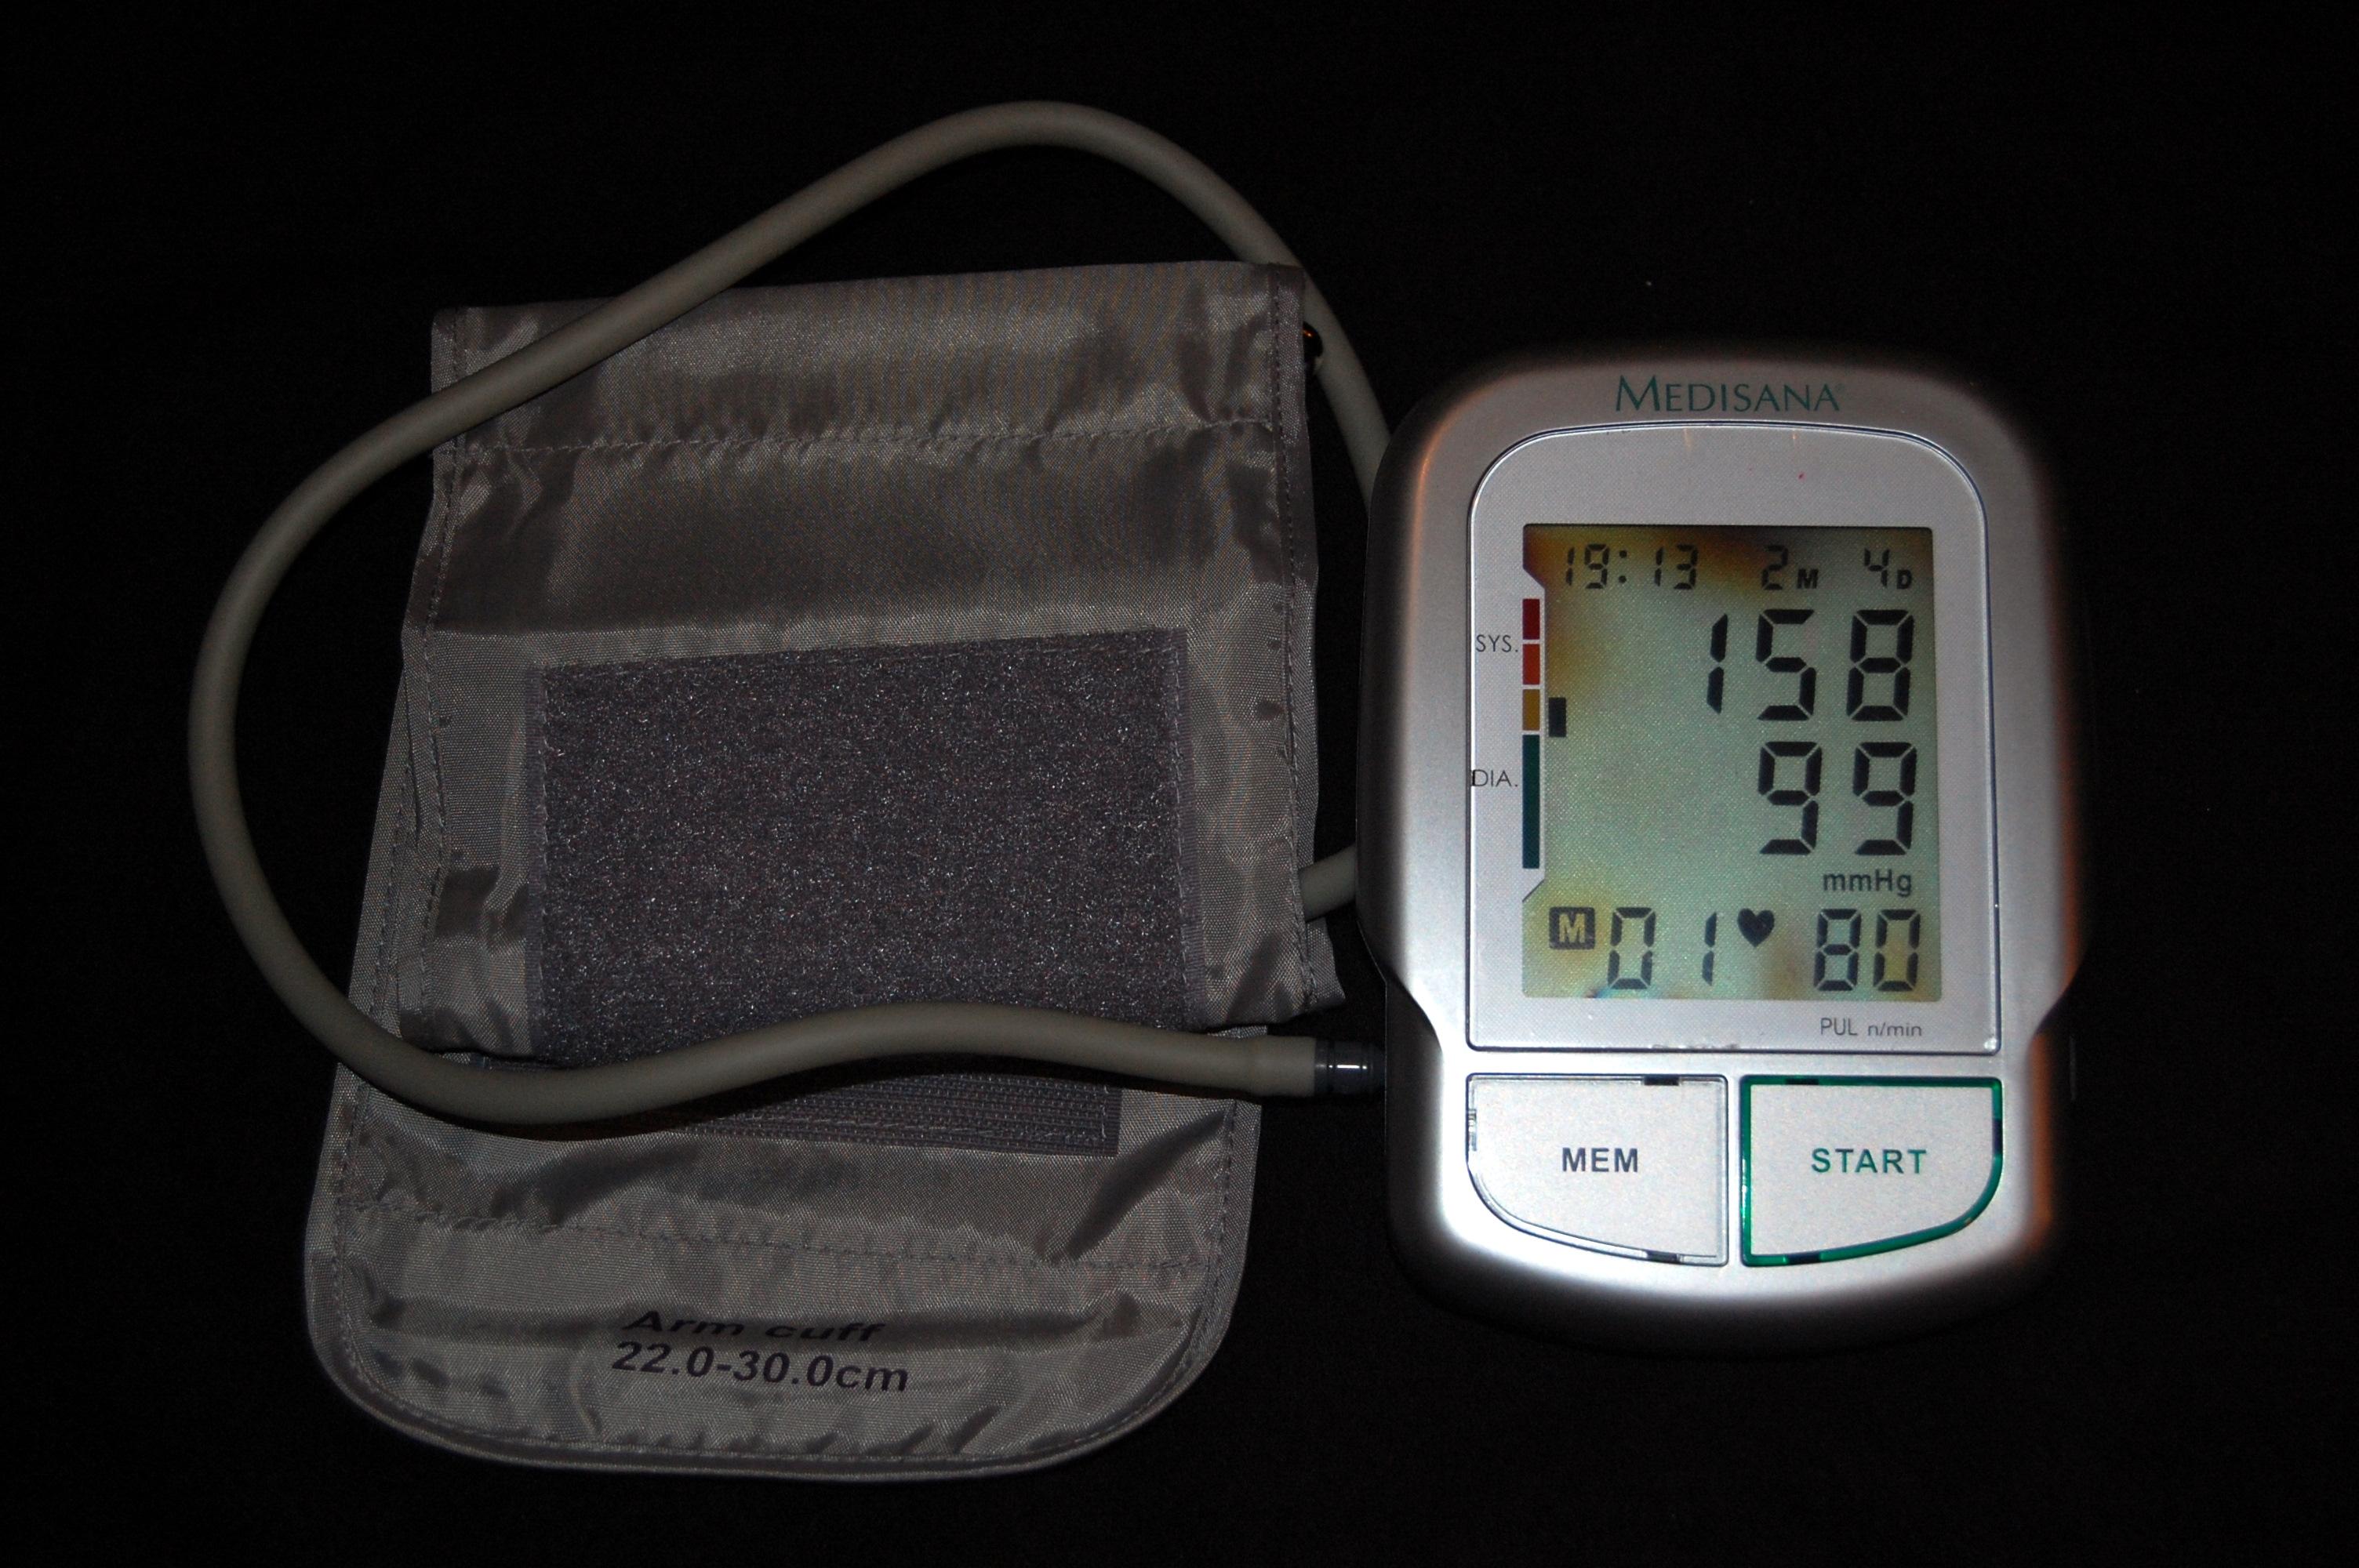 encefalopatija i hipertenzija hipertenzivna bolest srca je